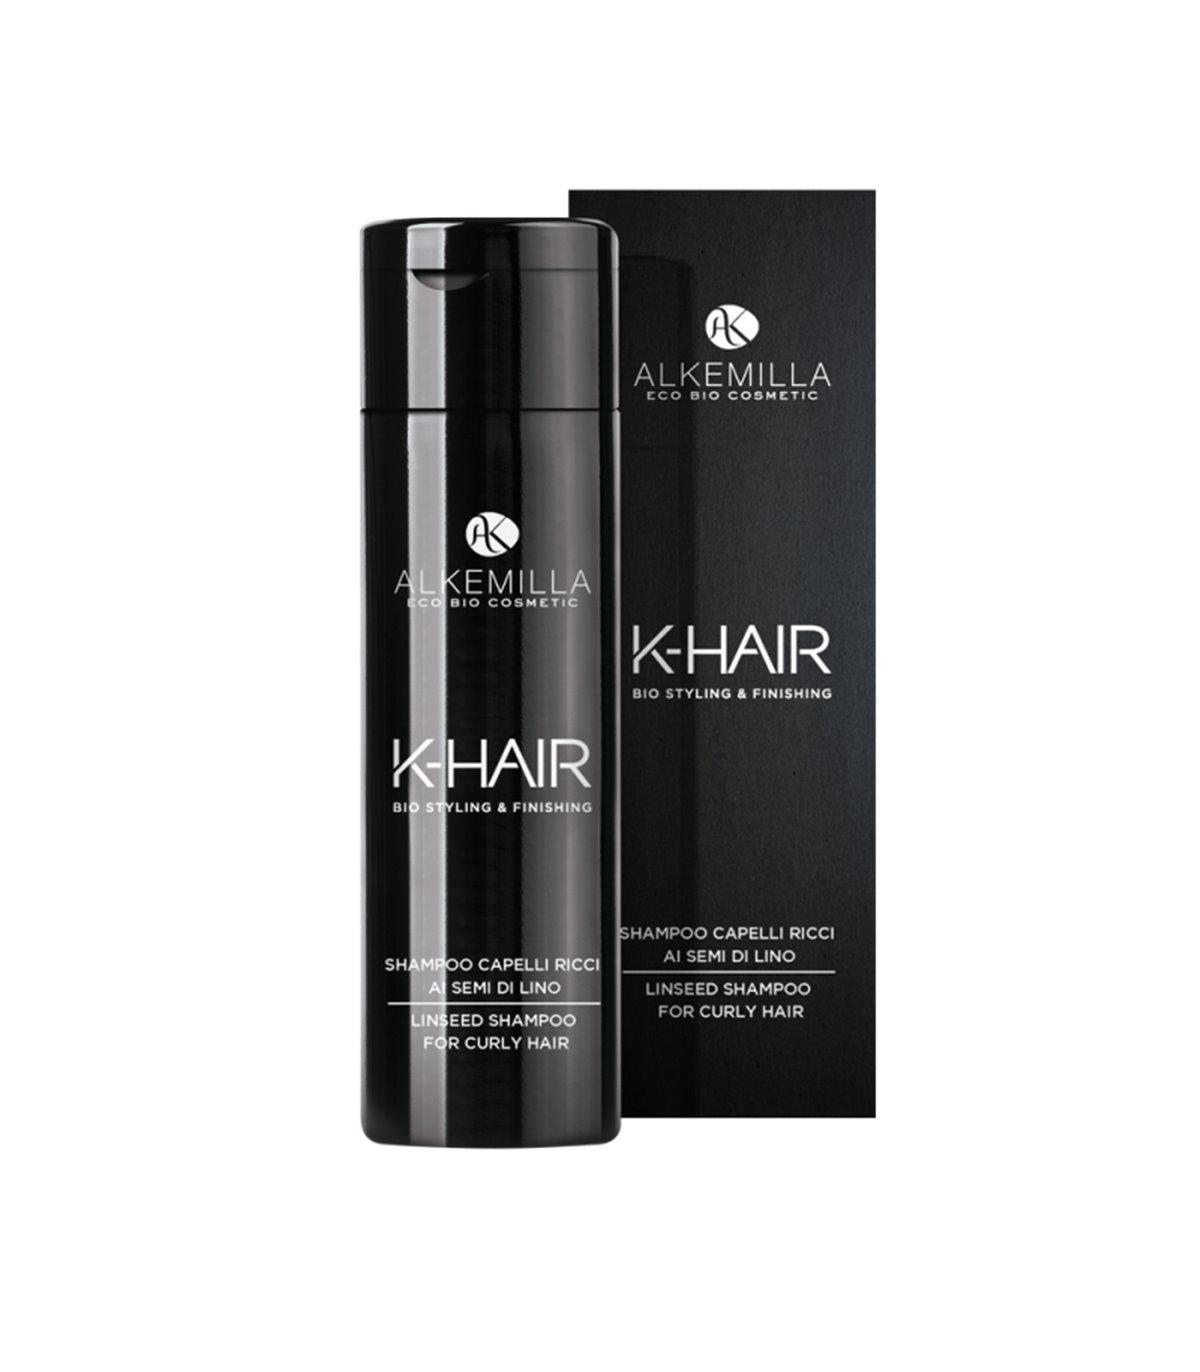 Shampoo near capelli ricci